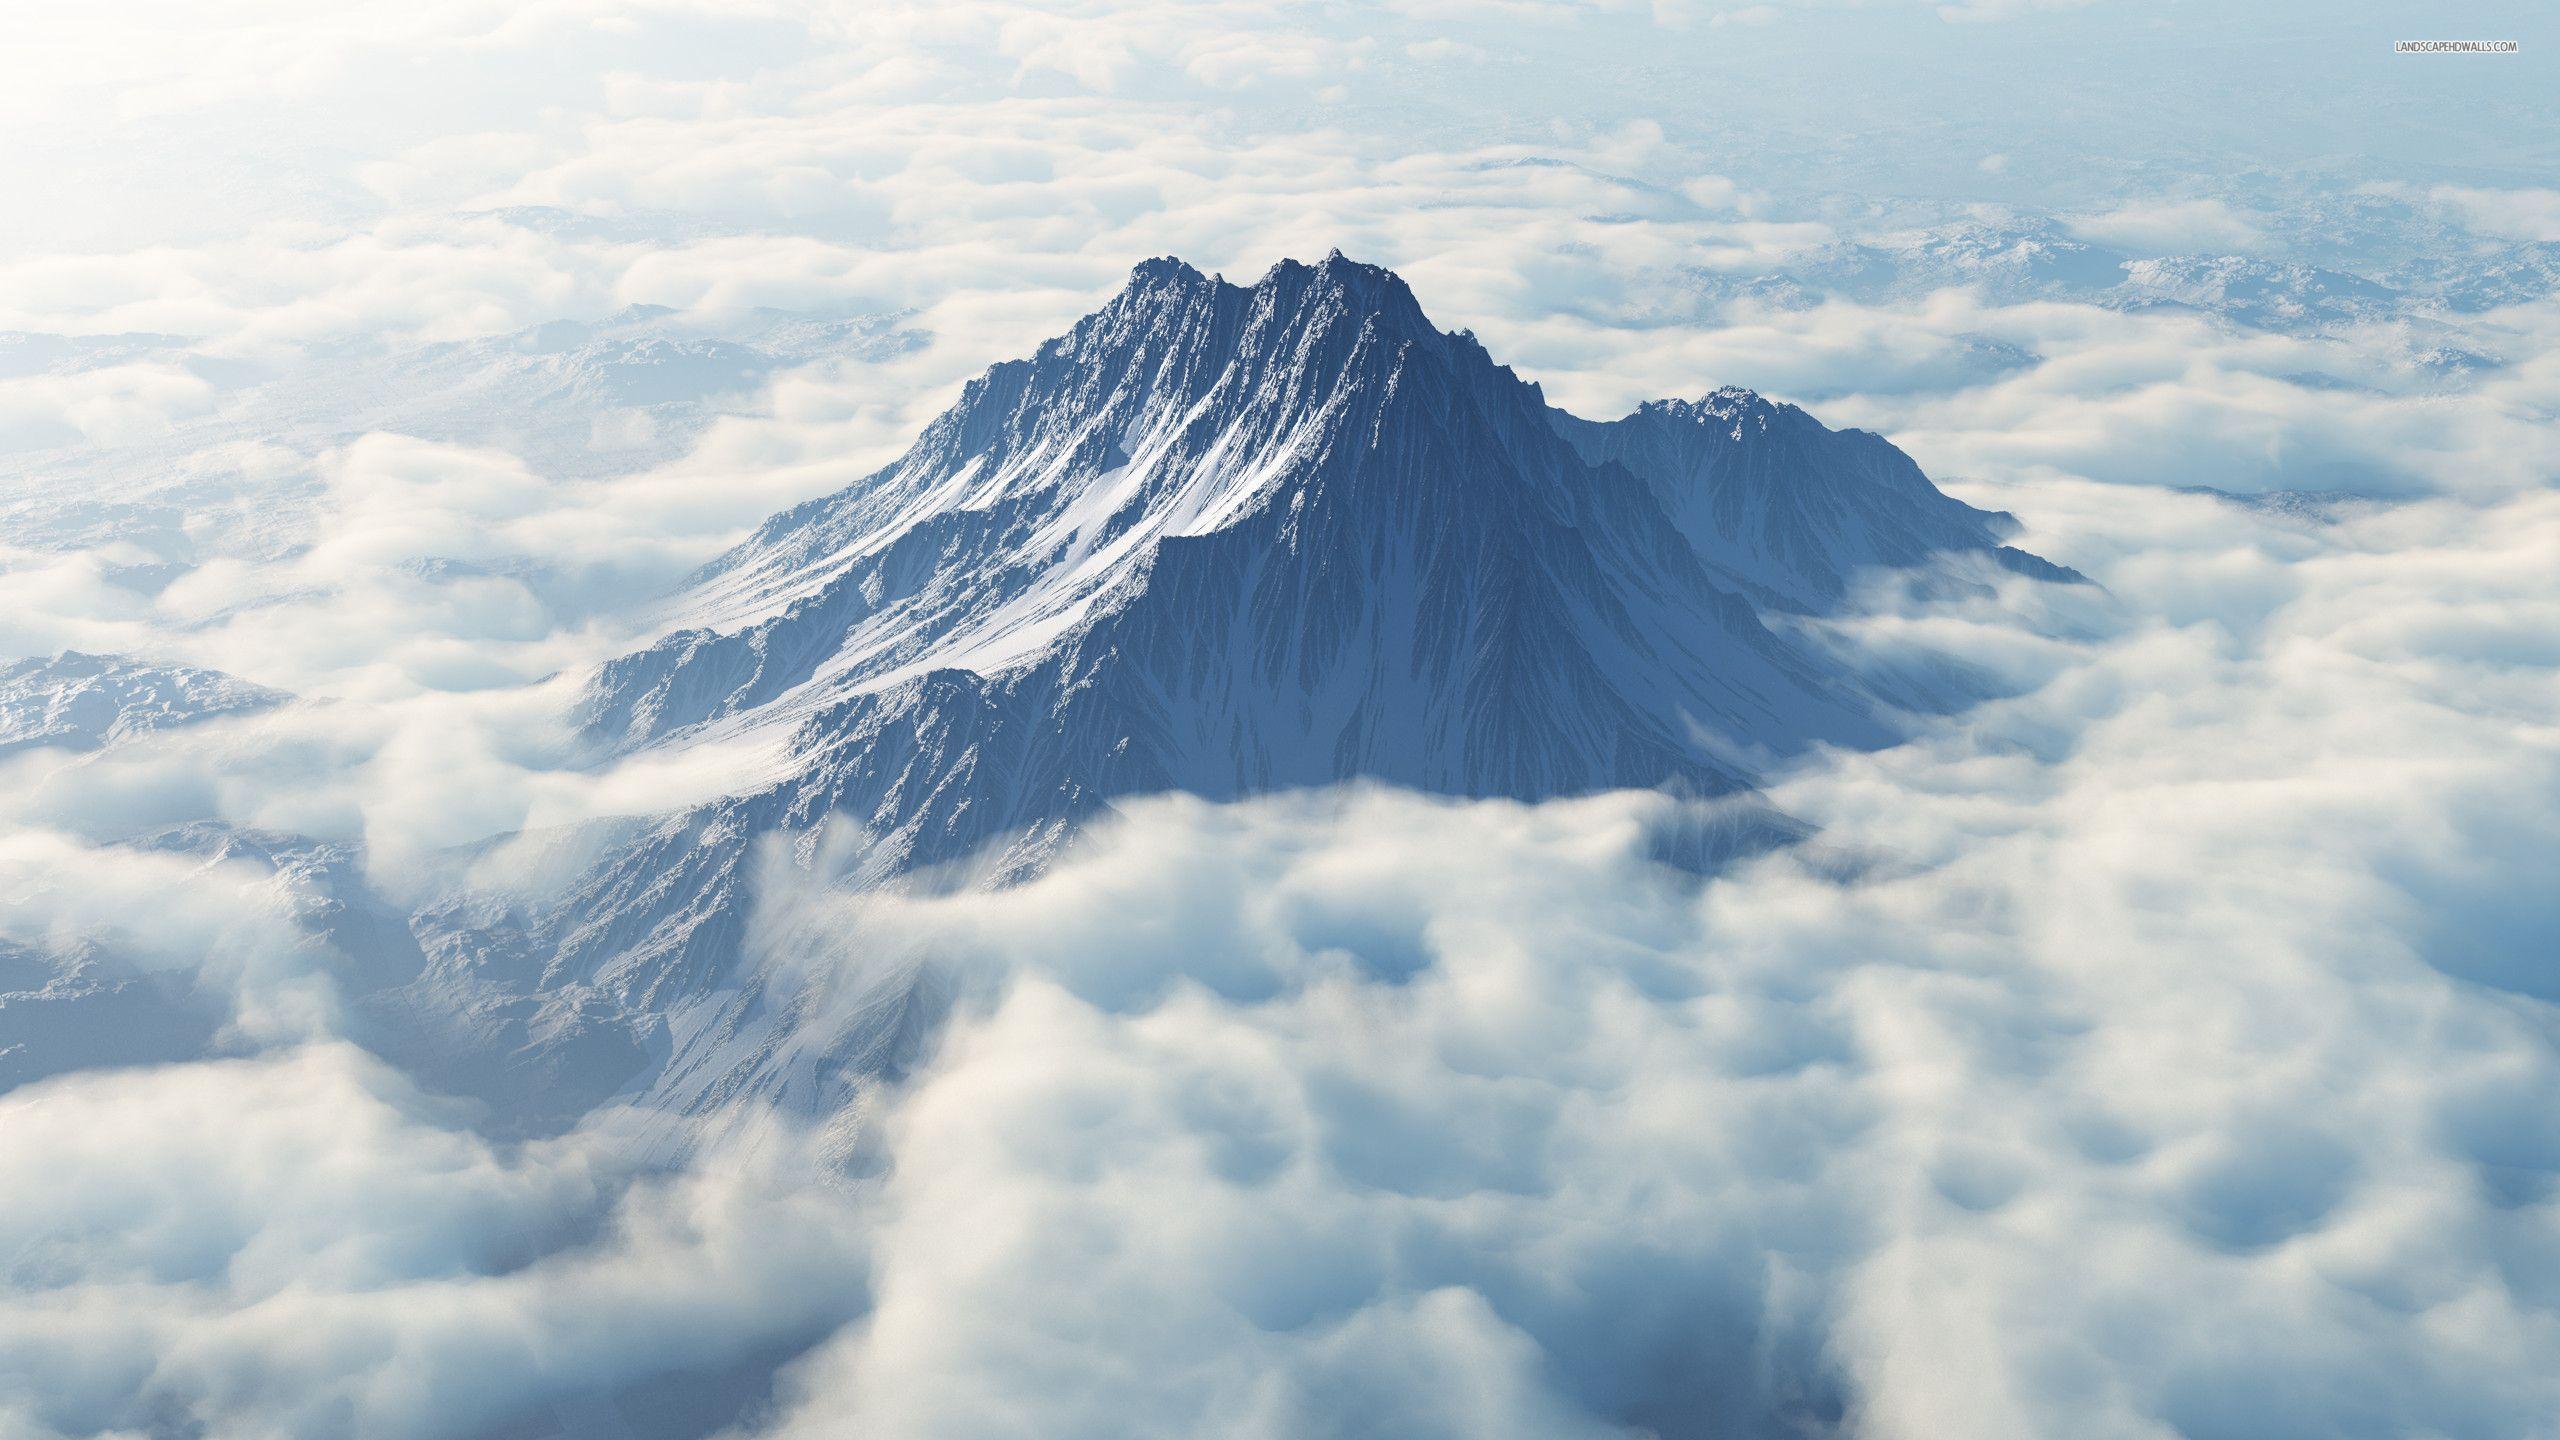 15 Best HD Mount Olympus Wallpapers 2560x1440